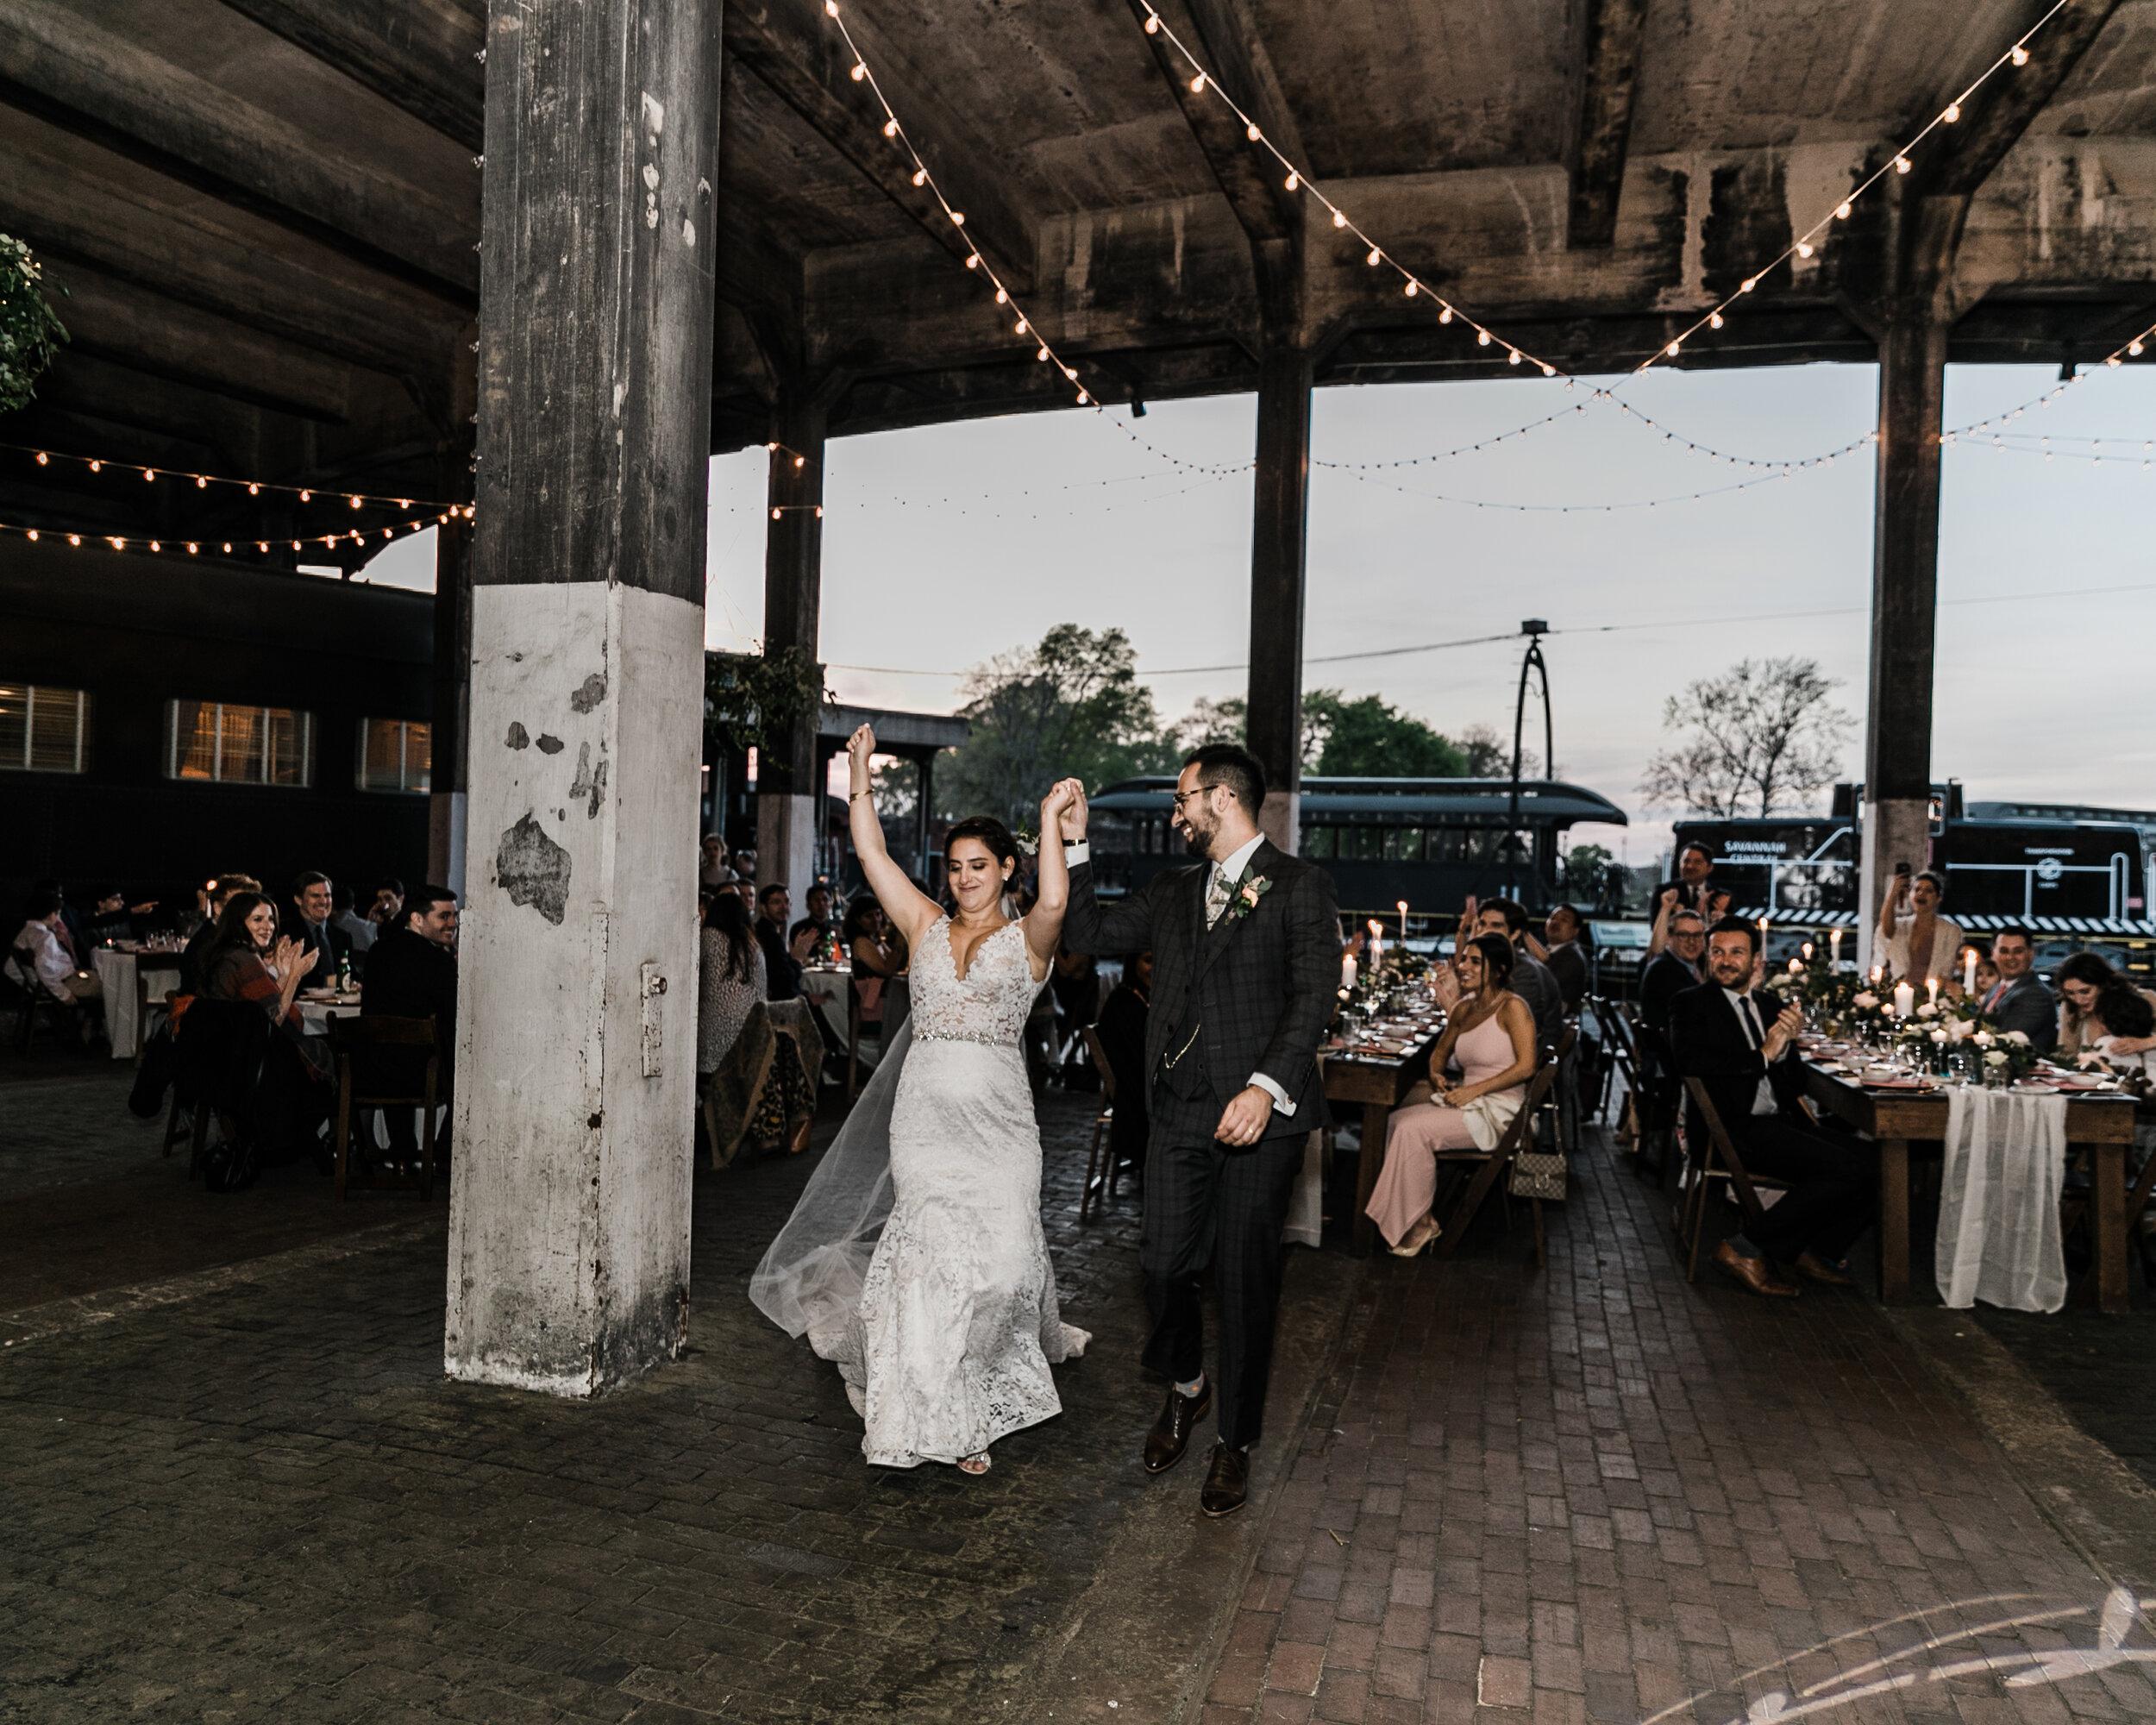 ivory-and-beau-blog-weddings-ivory-and-beau-couple-dominique-and-andres-savannah-florist-wedding-planning-savannah-bridal-boutique-wedding-flowers-KIP_WEBERWEDDING_RAILROADMUSEUM-1412.JPG